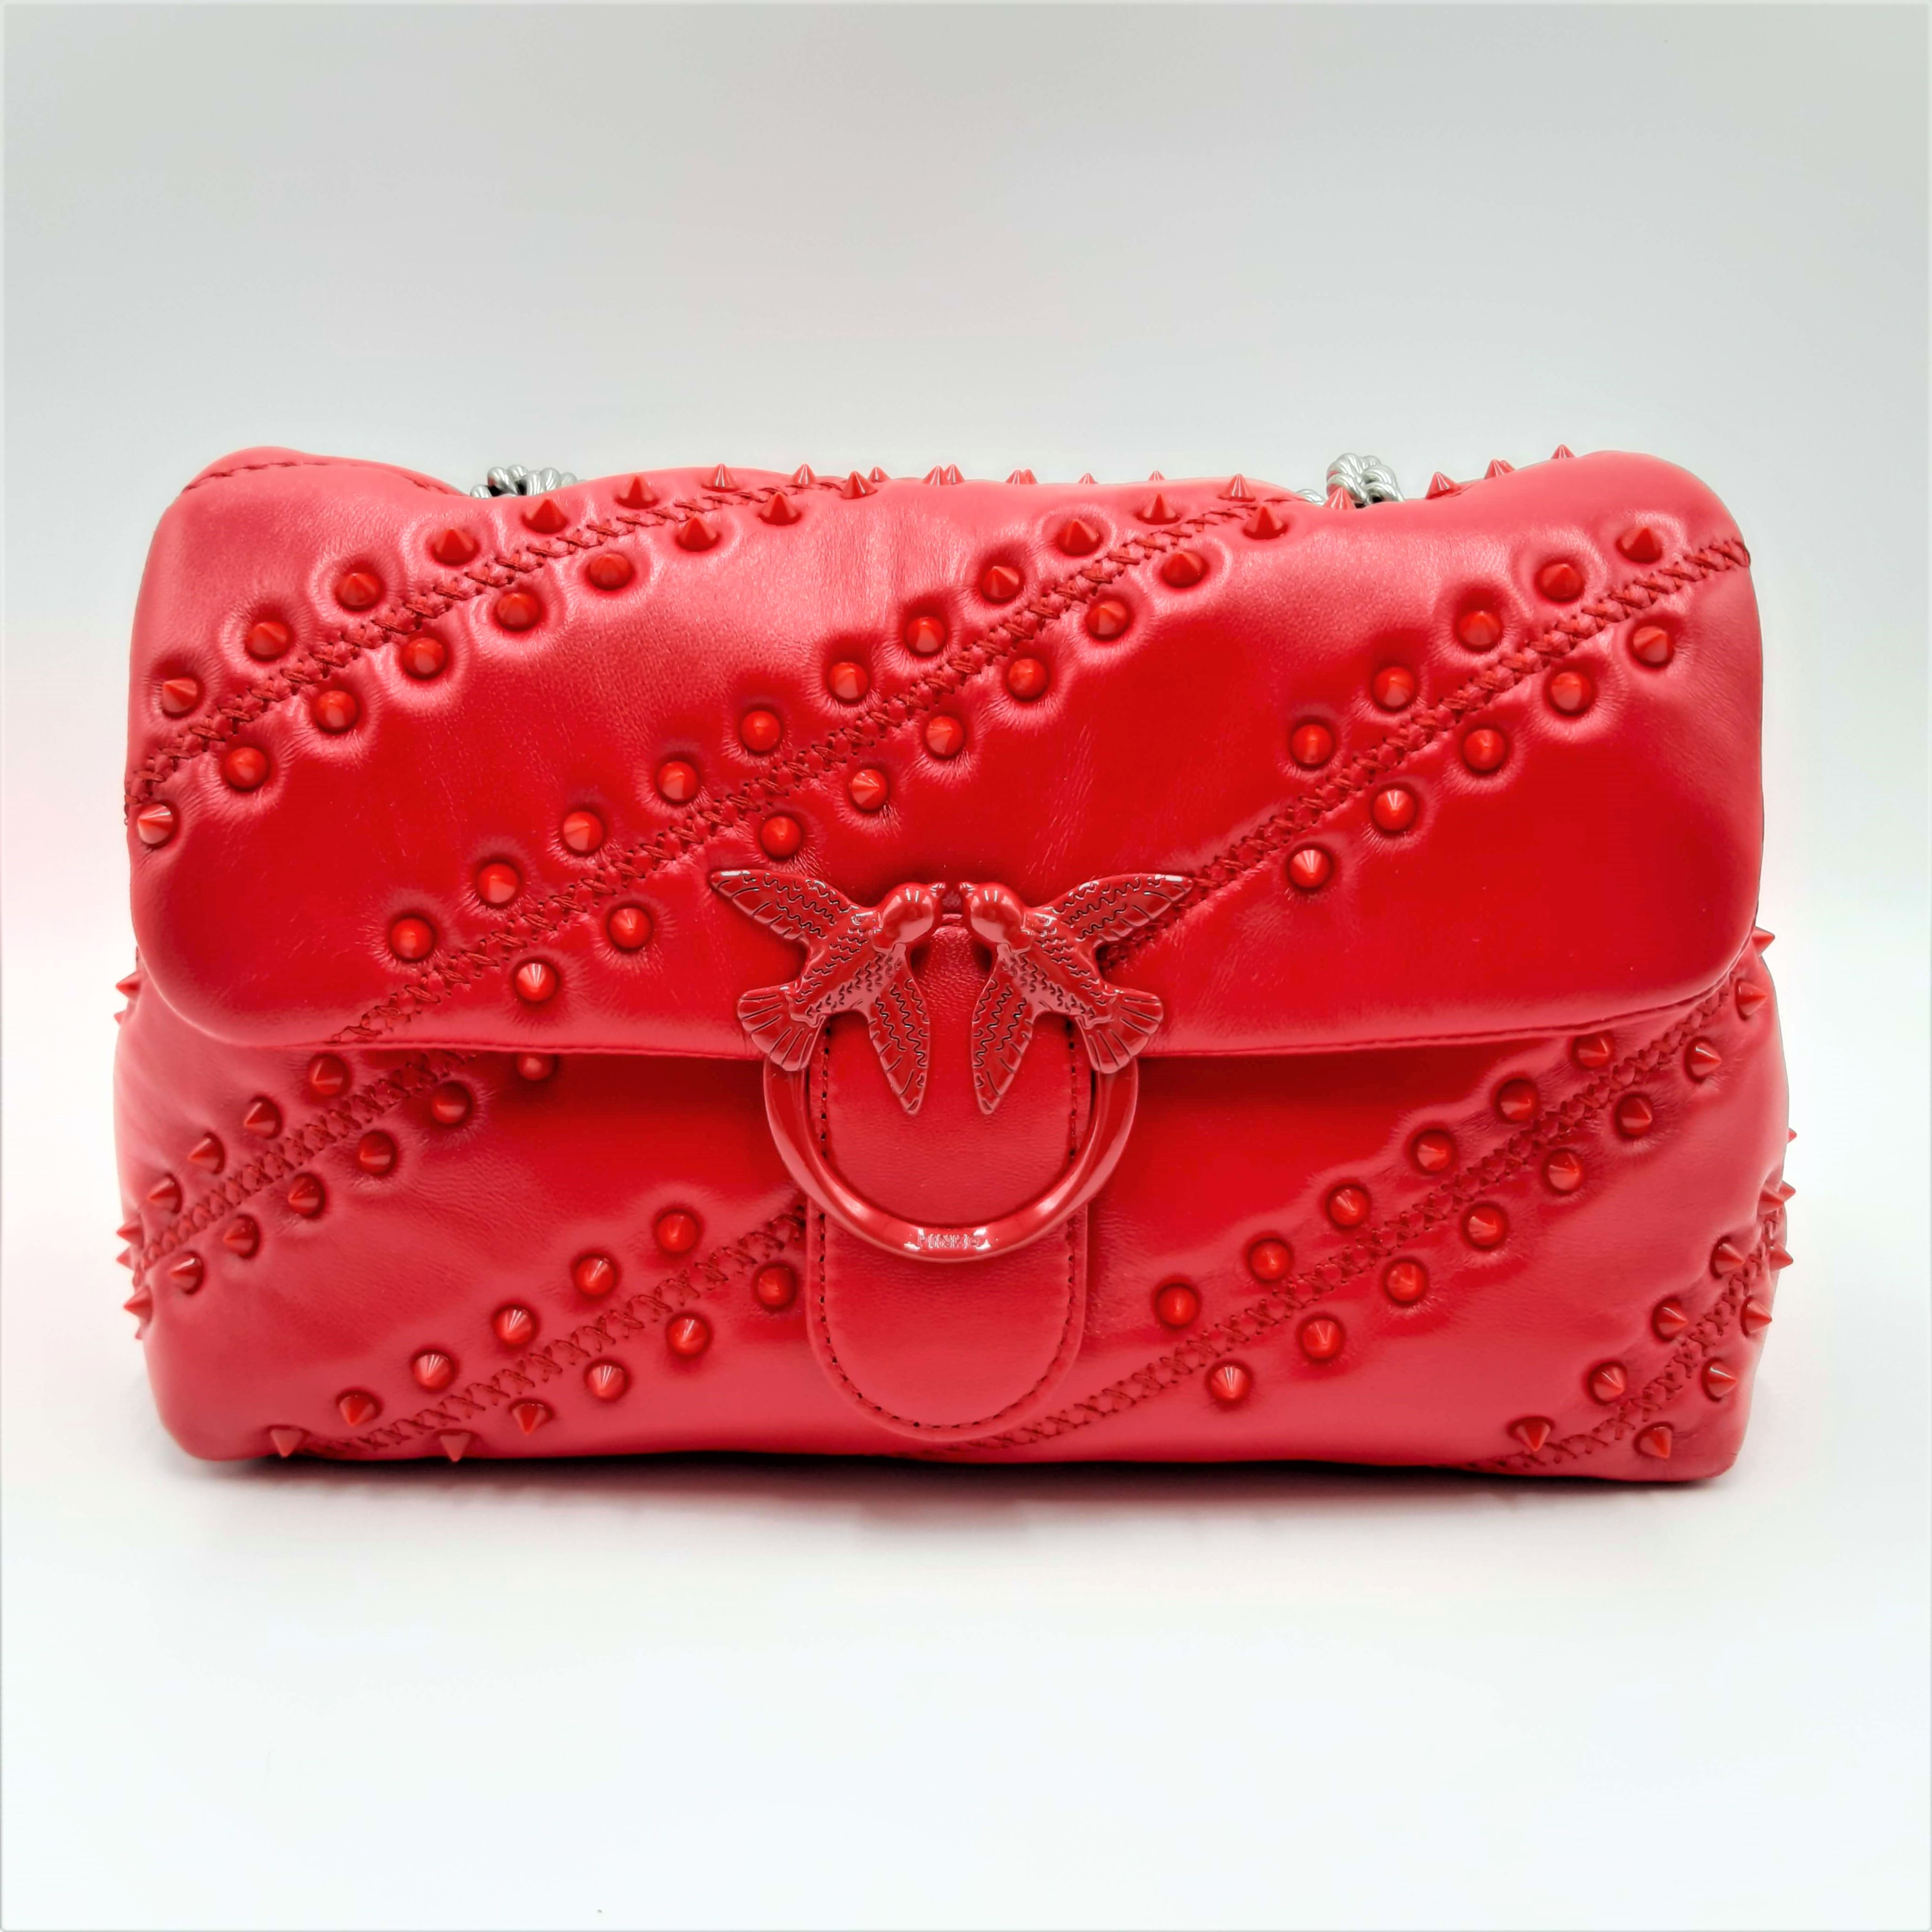 Borsa Love Classic Puff Soft Studs rossa Pinko